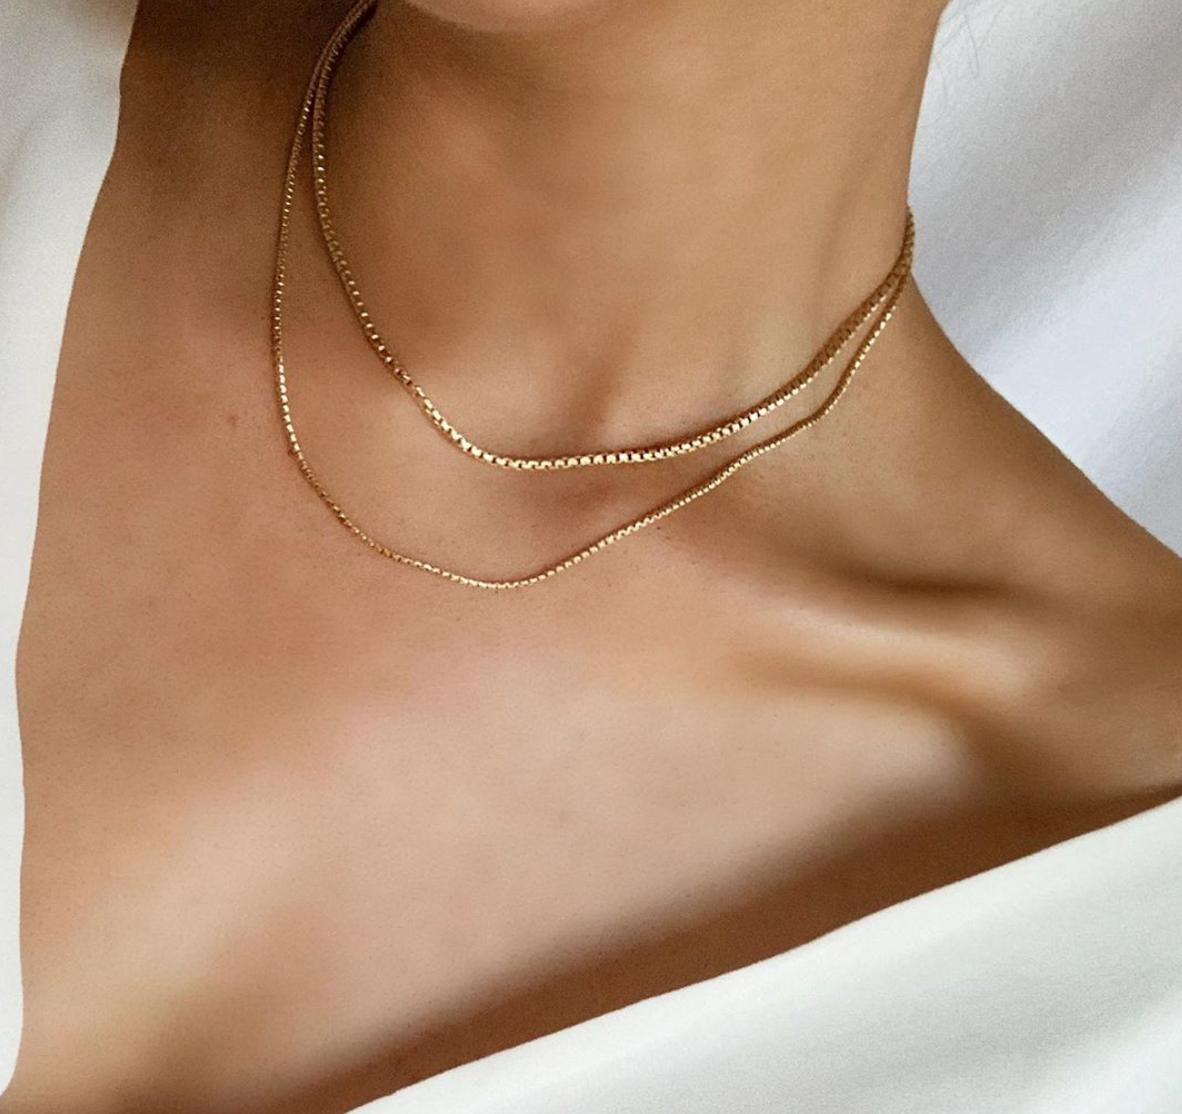 Minimalist Gold Chains